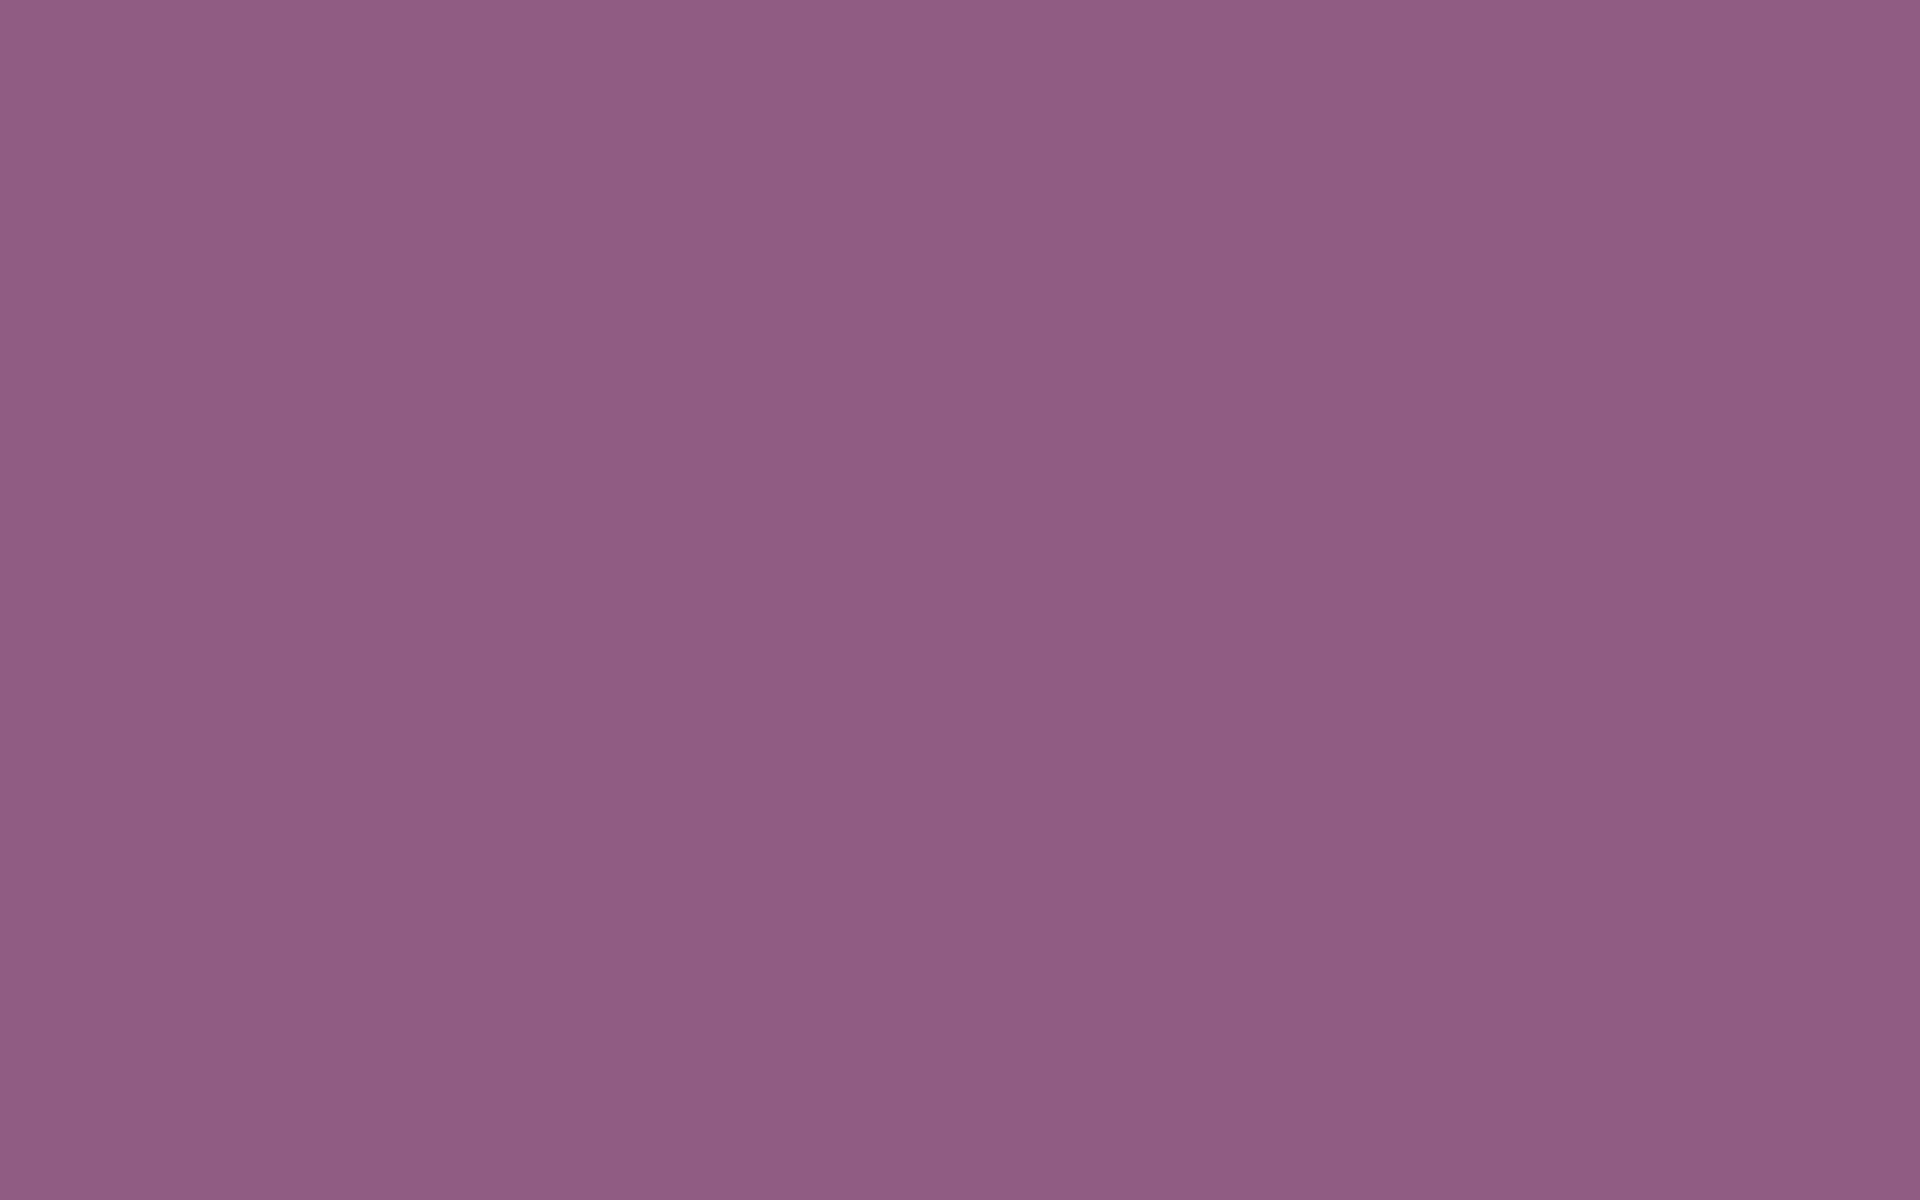 1920x1200 Antique Fuchsia Solid Color Background